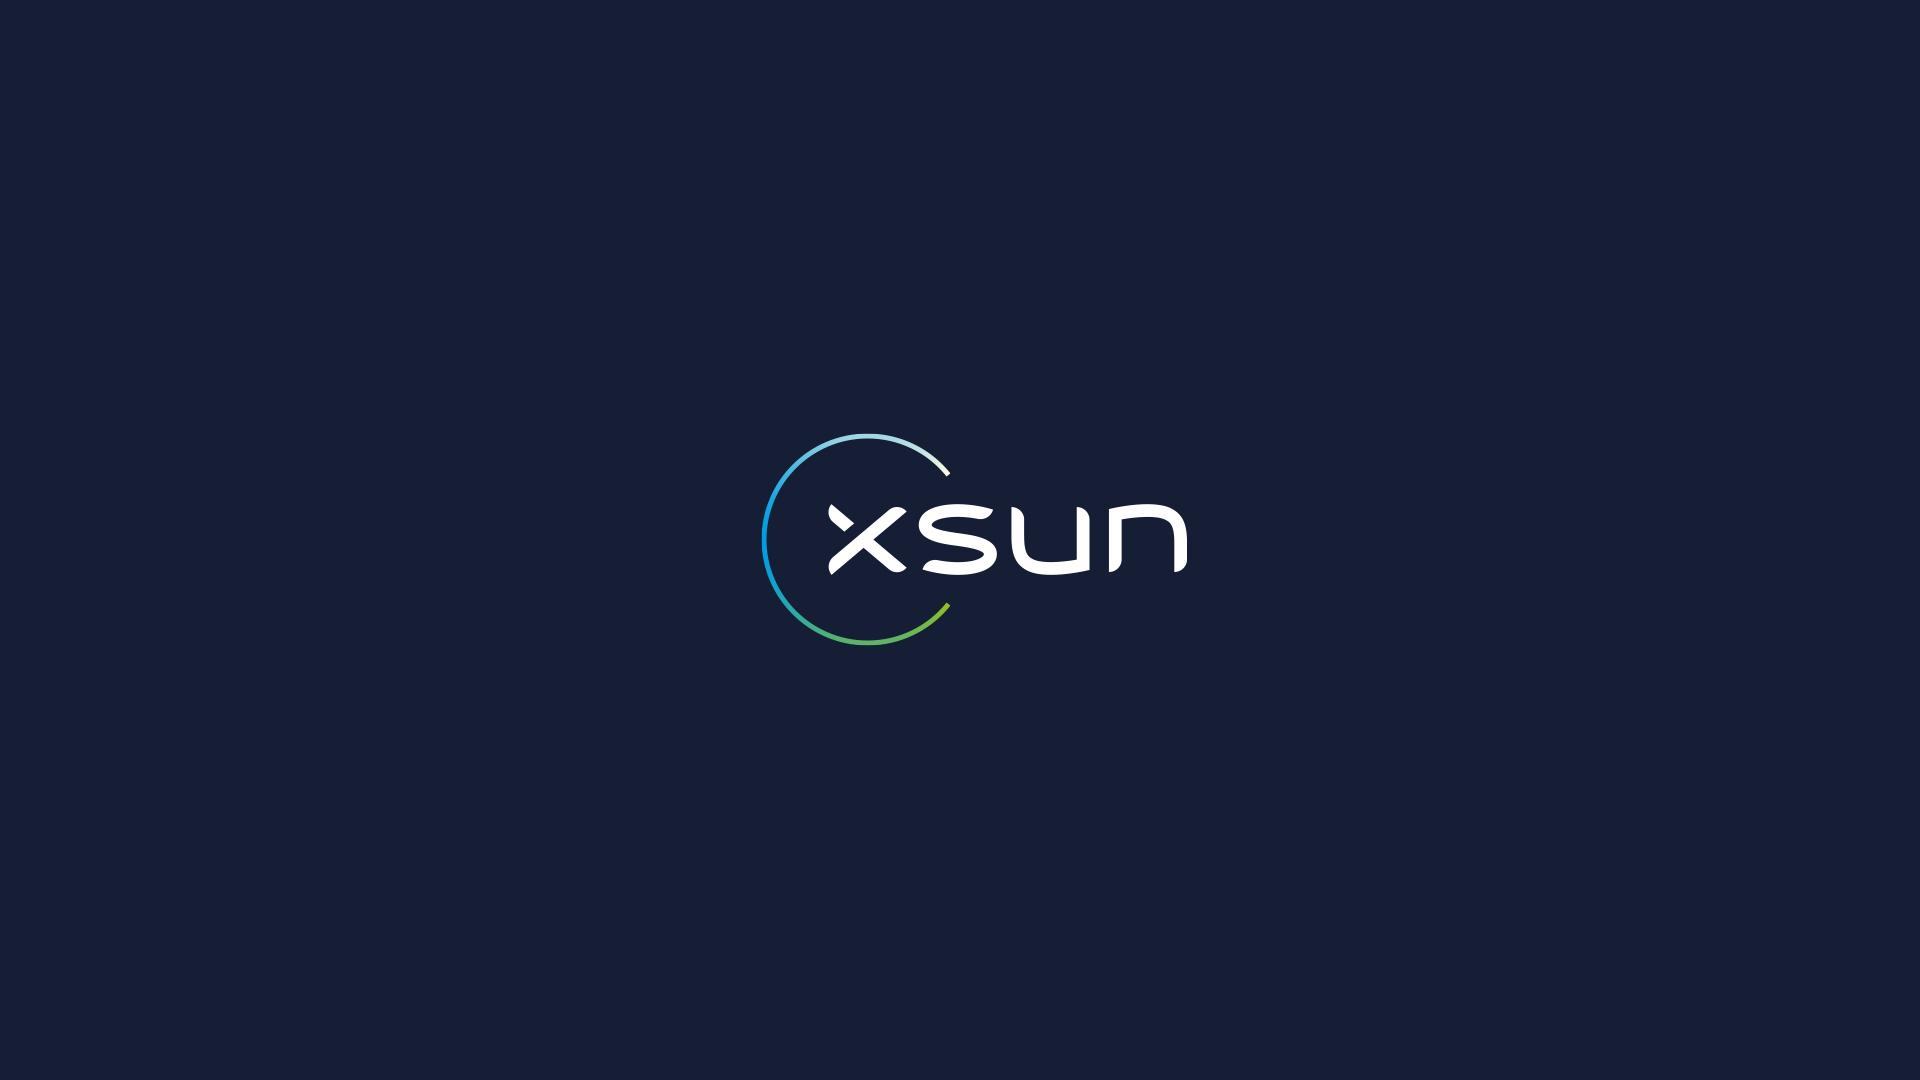 Logotypes-Xsun